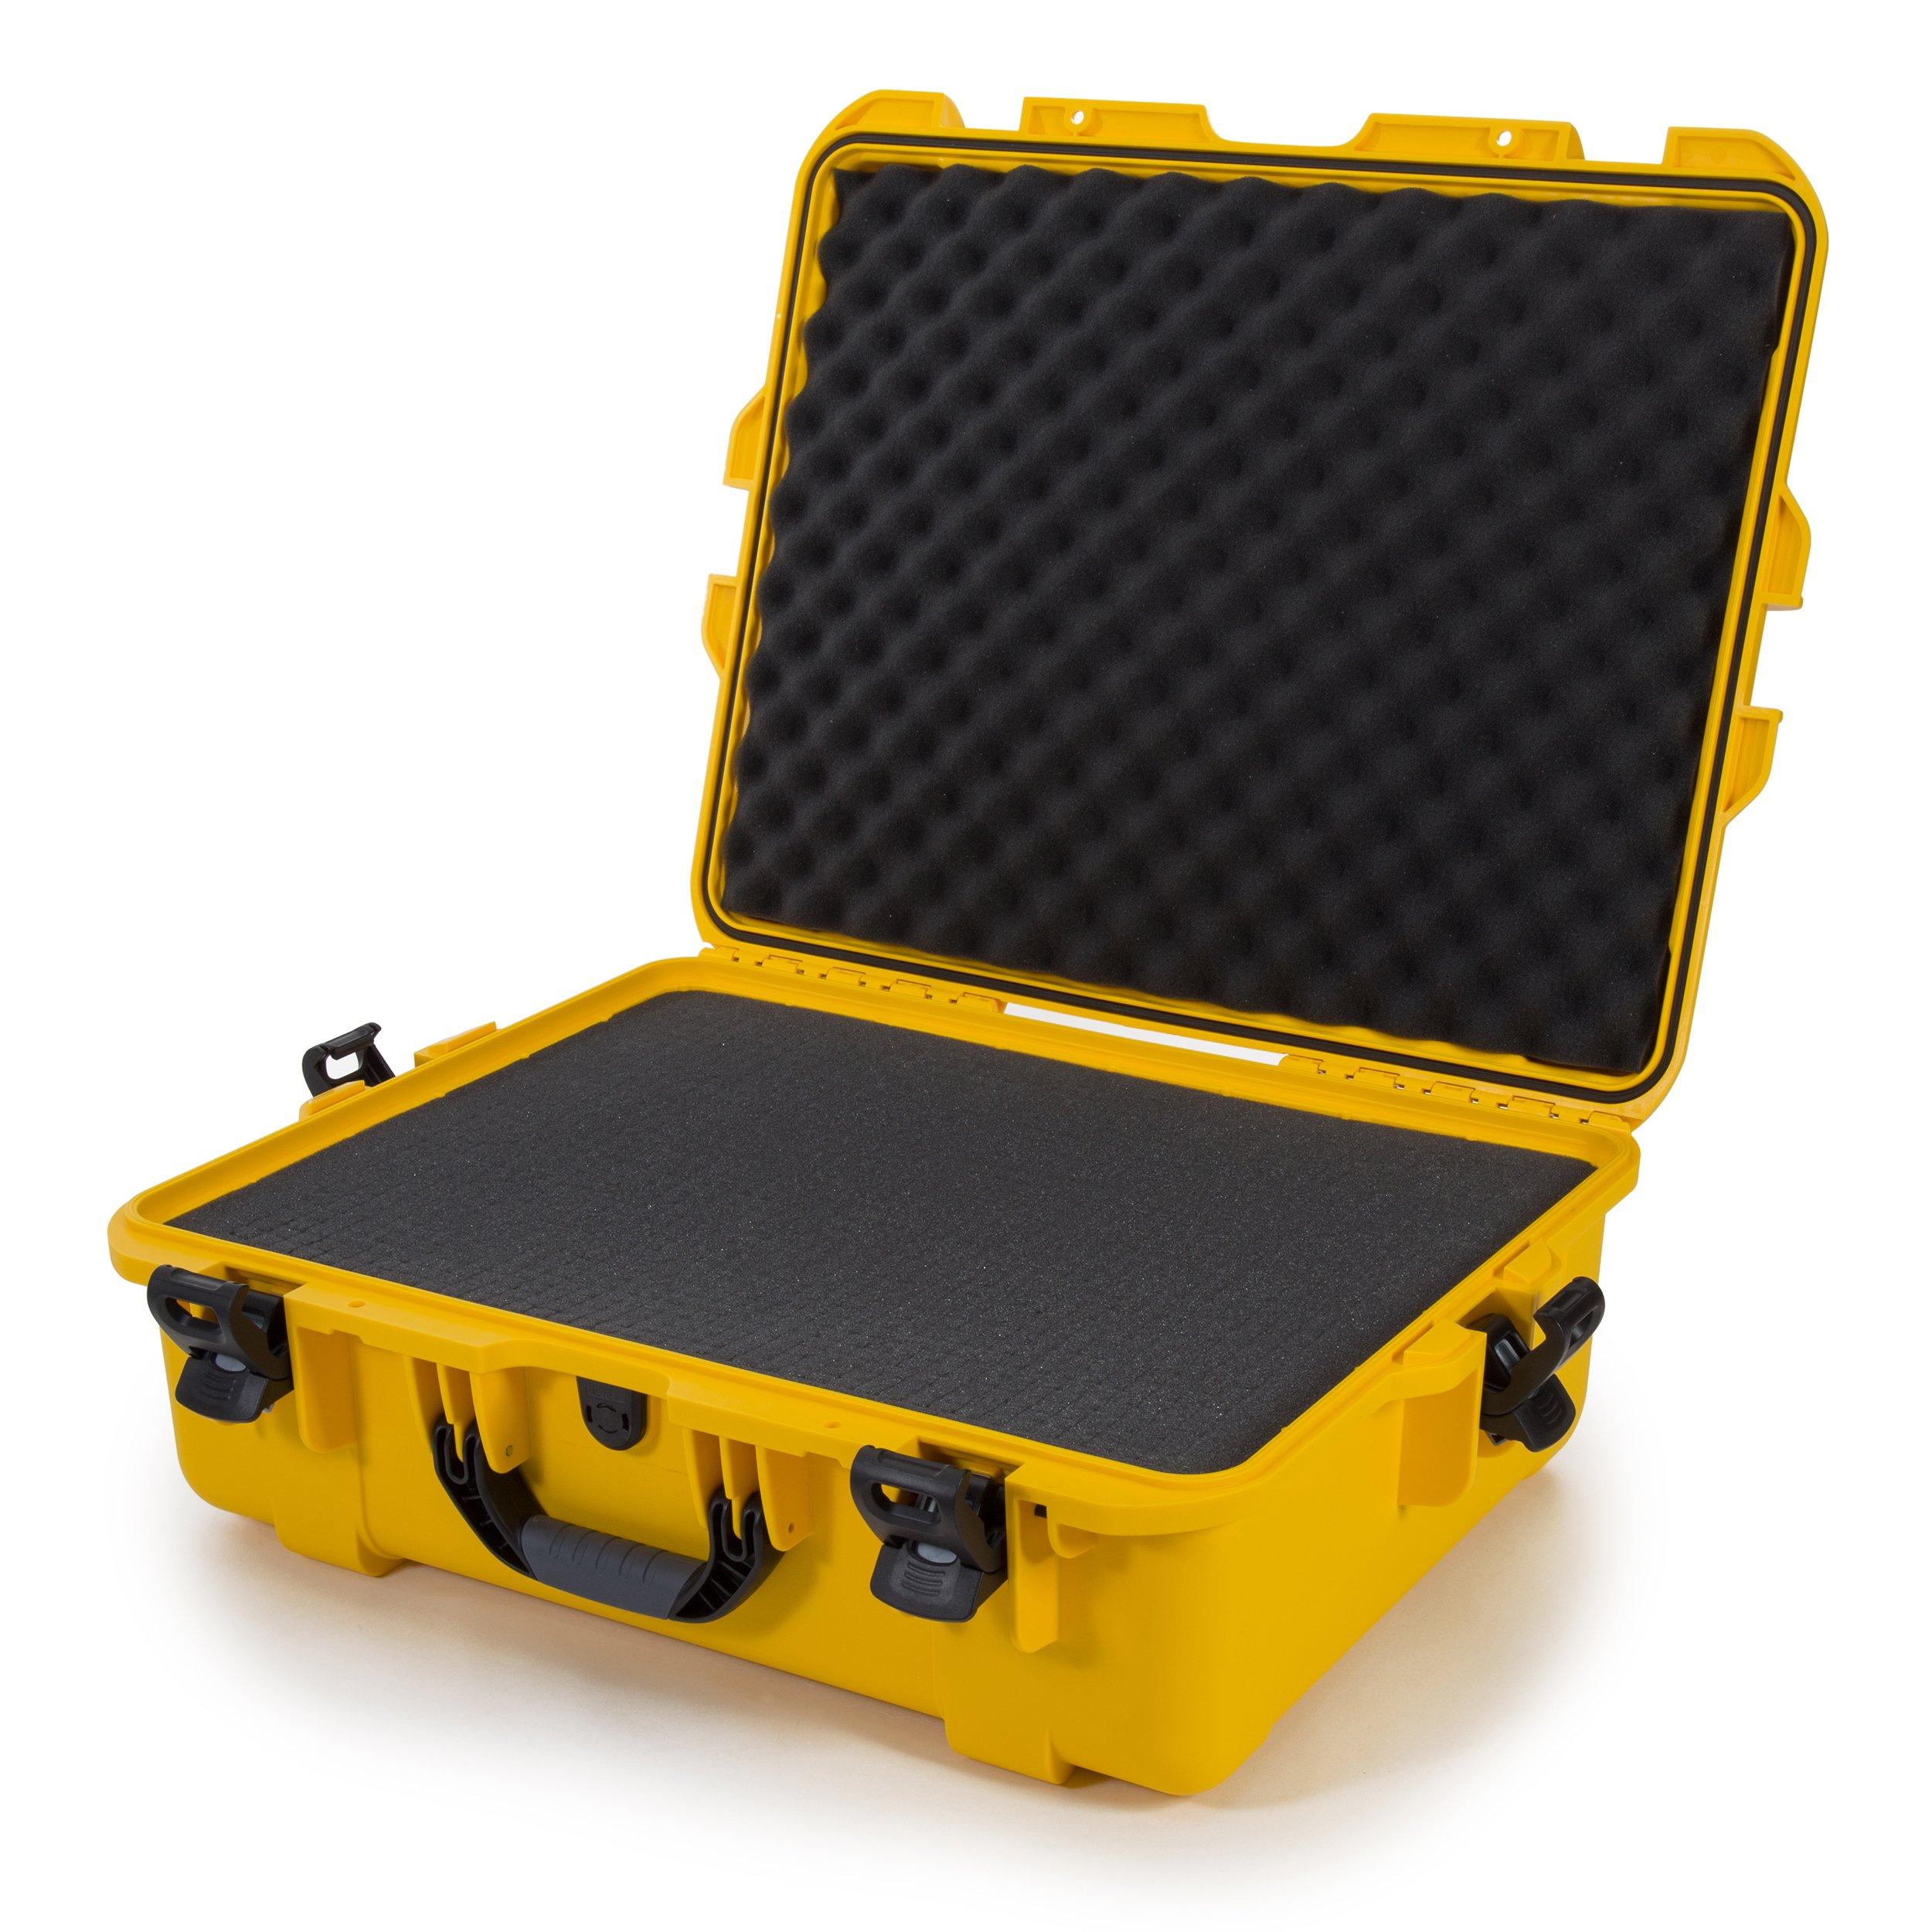 Nanuk 945 Waterproof Hard Case with Foam Insert - Yellow - Made in Canada by Nanuk